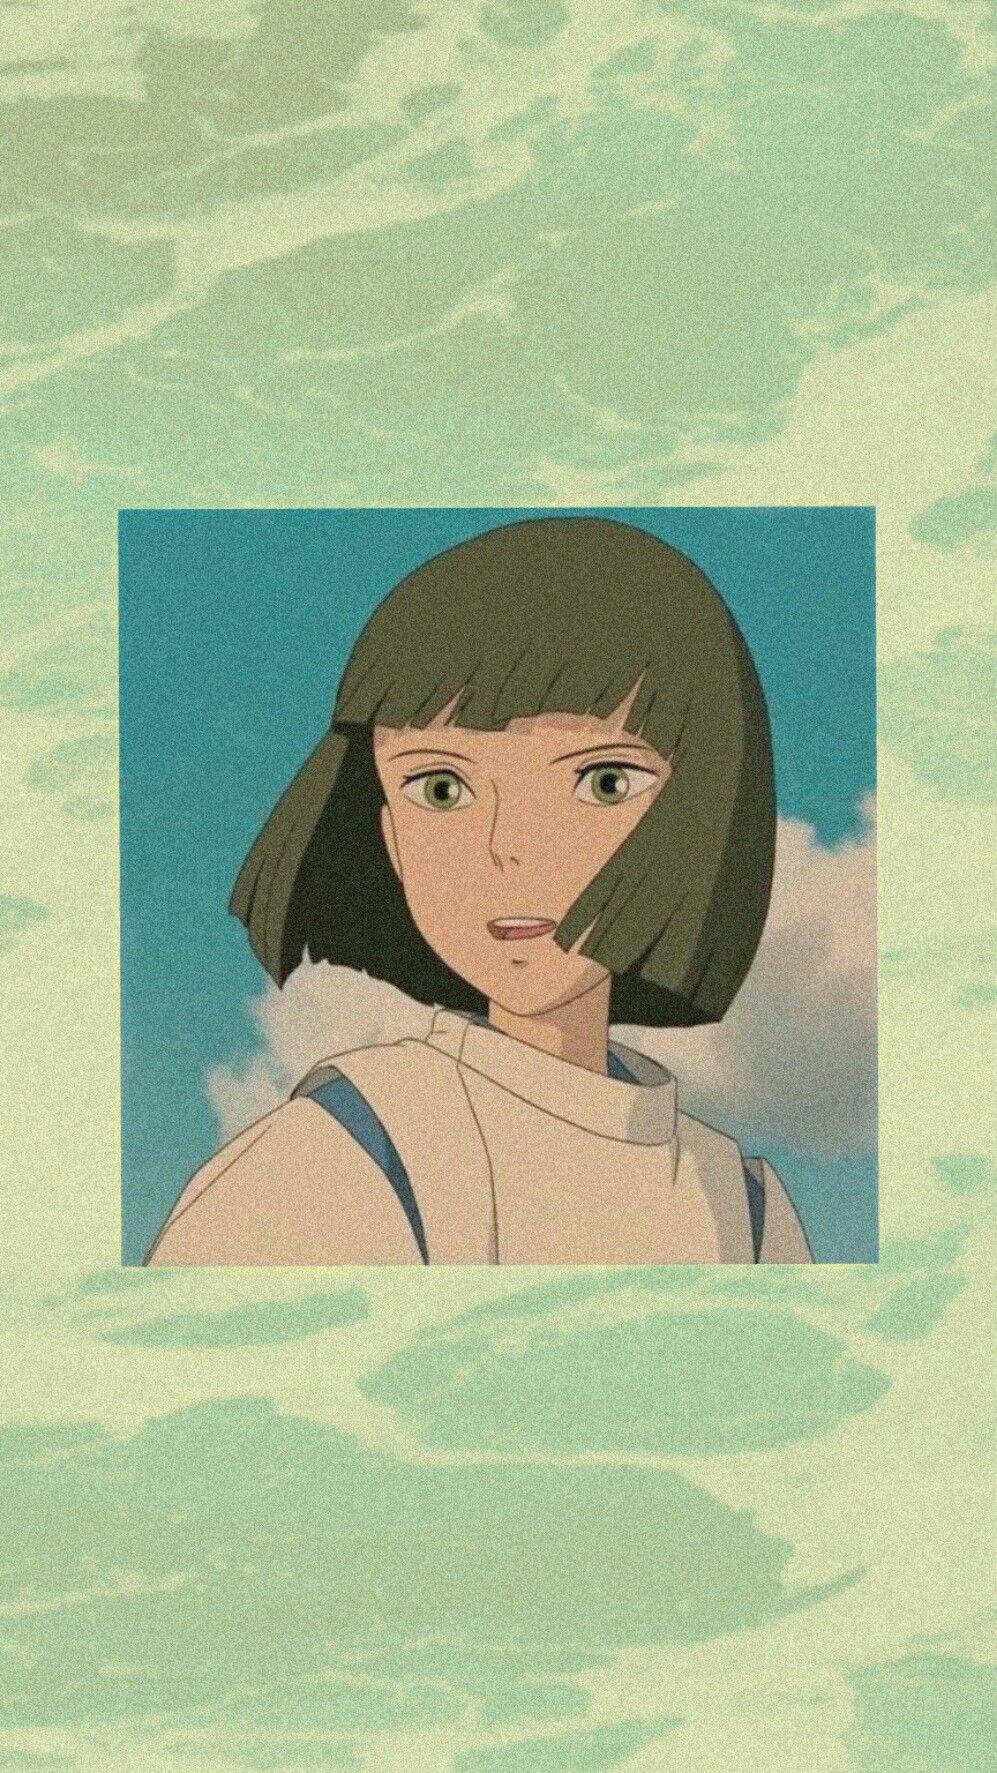 Aesthetic Wallpaper Haku Spirited Away Wallpaper Ghibli Artwork Cowboy Bebop Anime